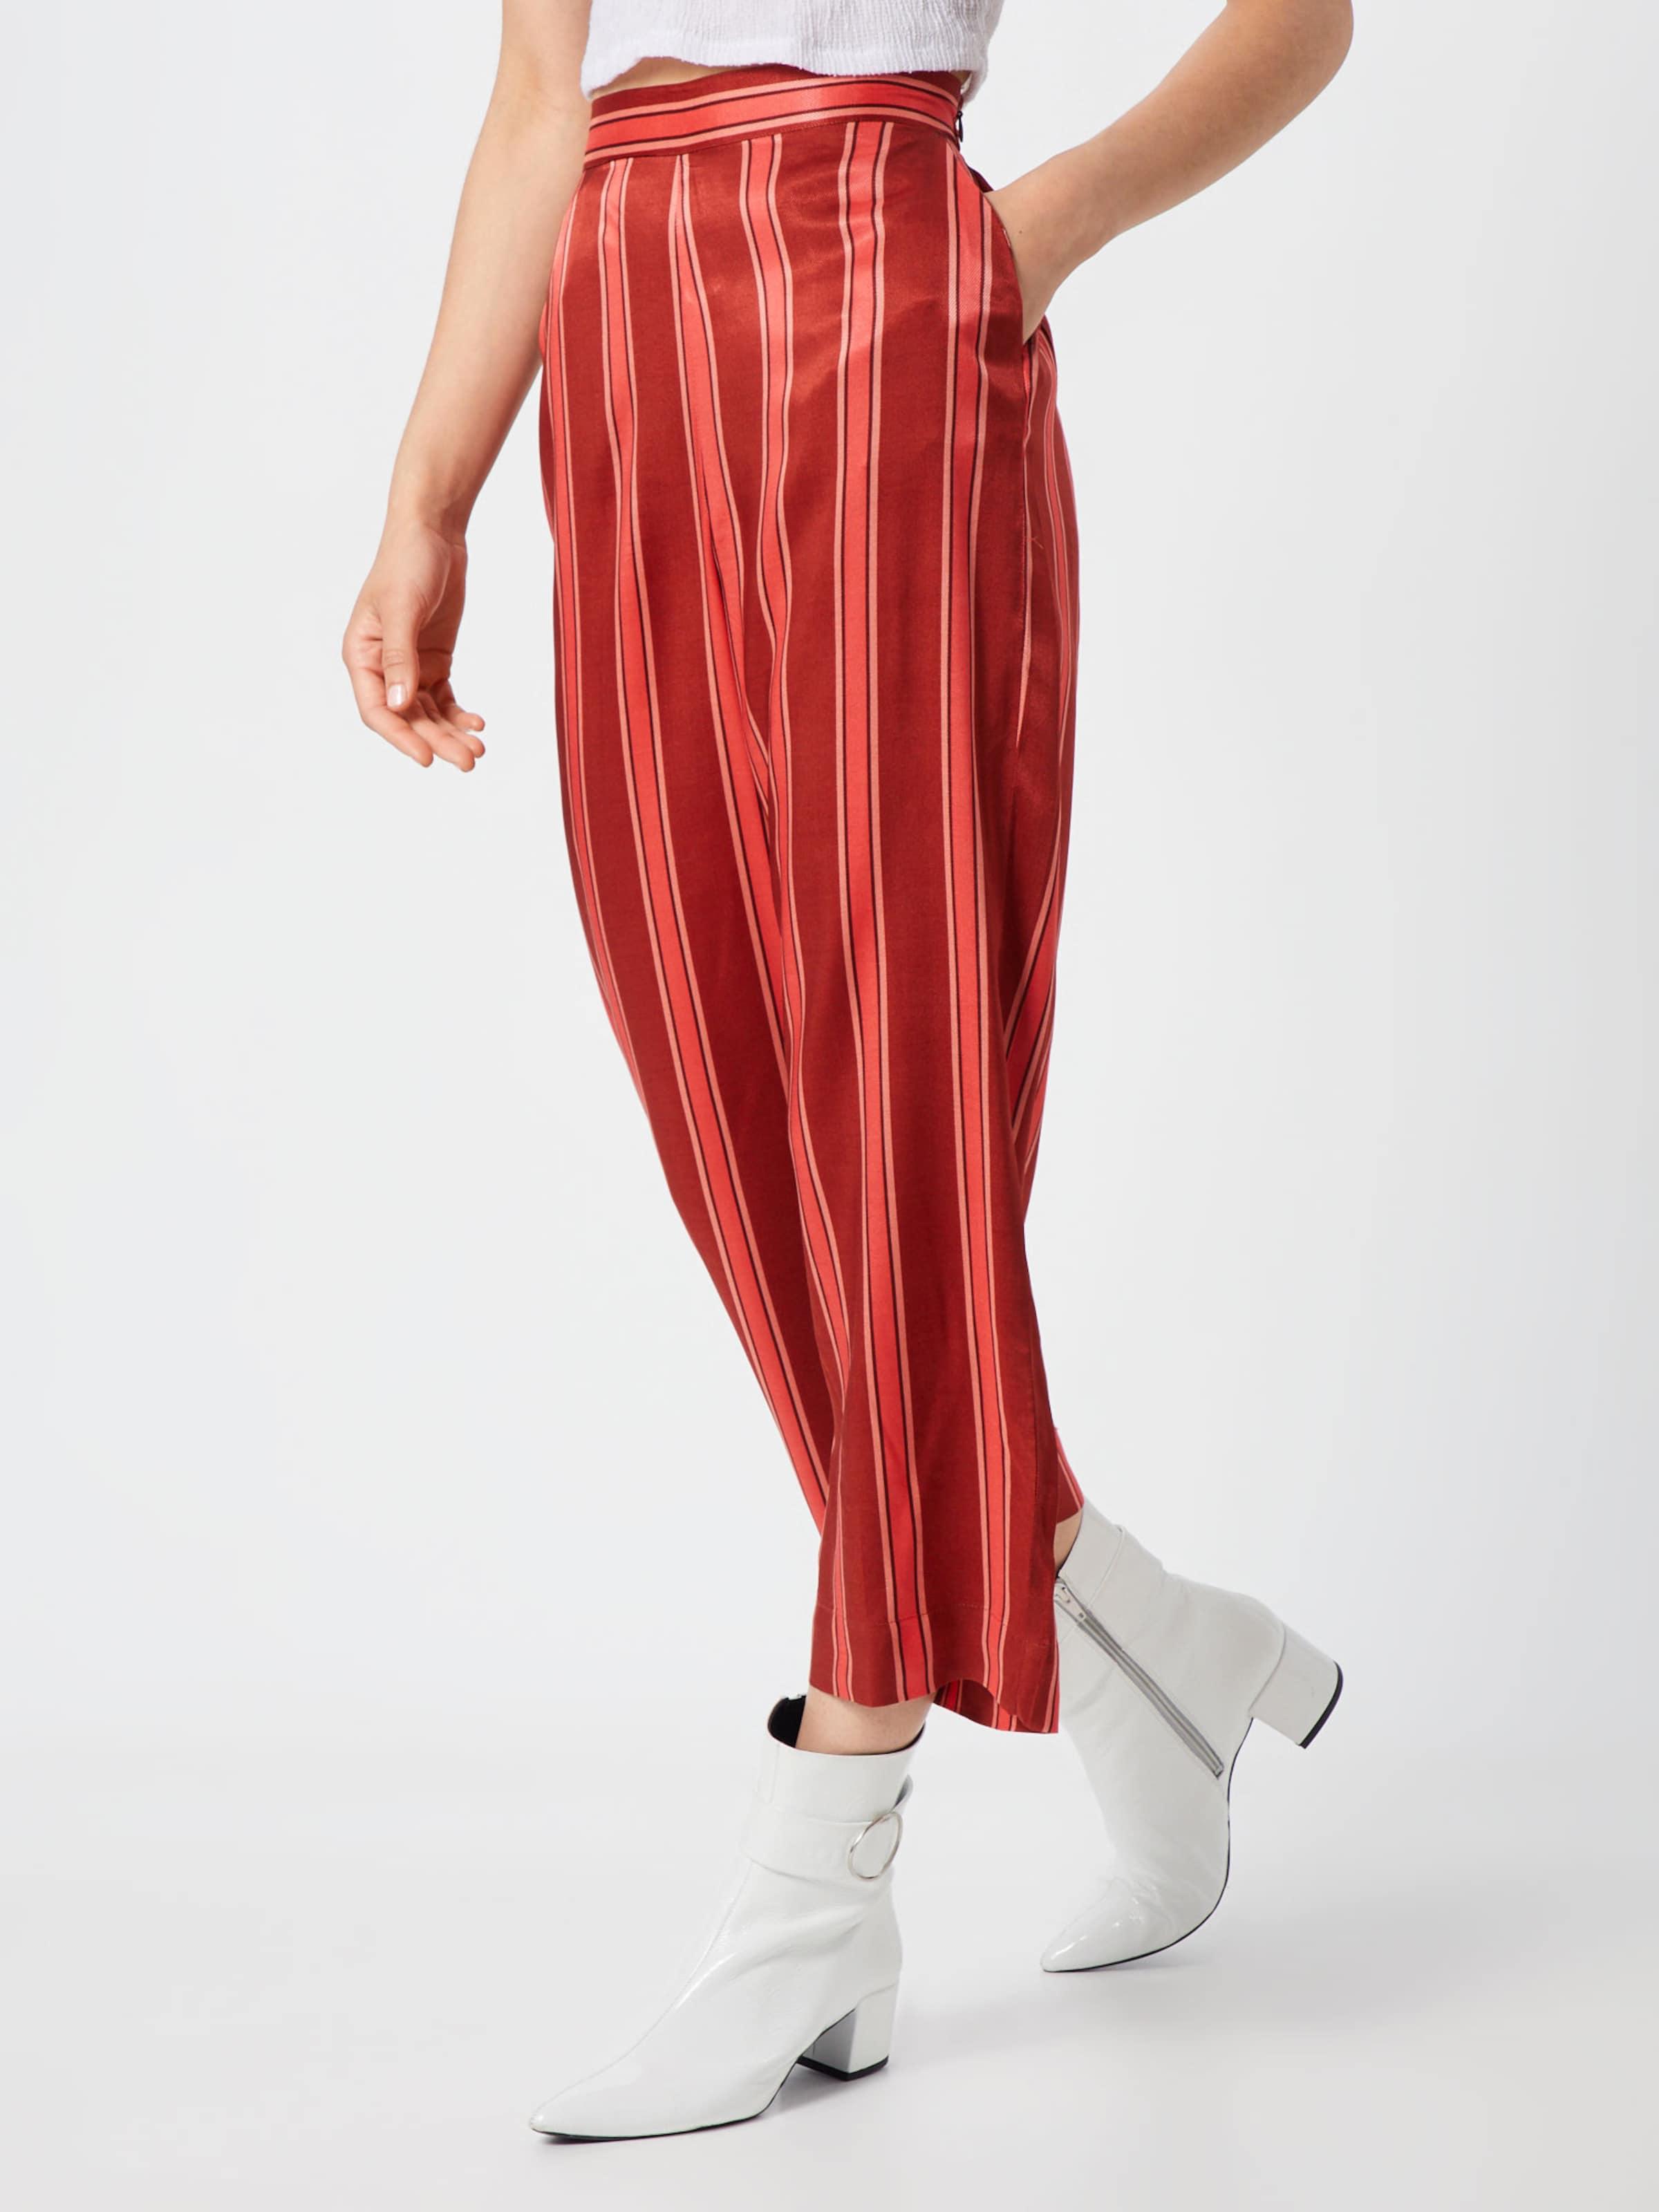 SaumonRouge Orangé En Soaked Pantalon 'salma' In Luxury kuZXOPi